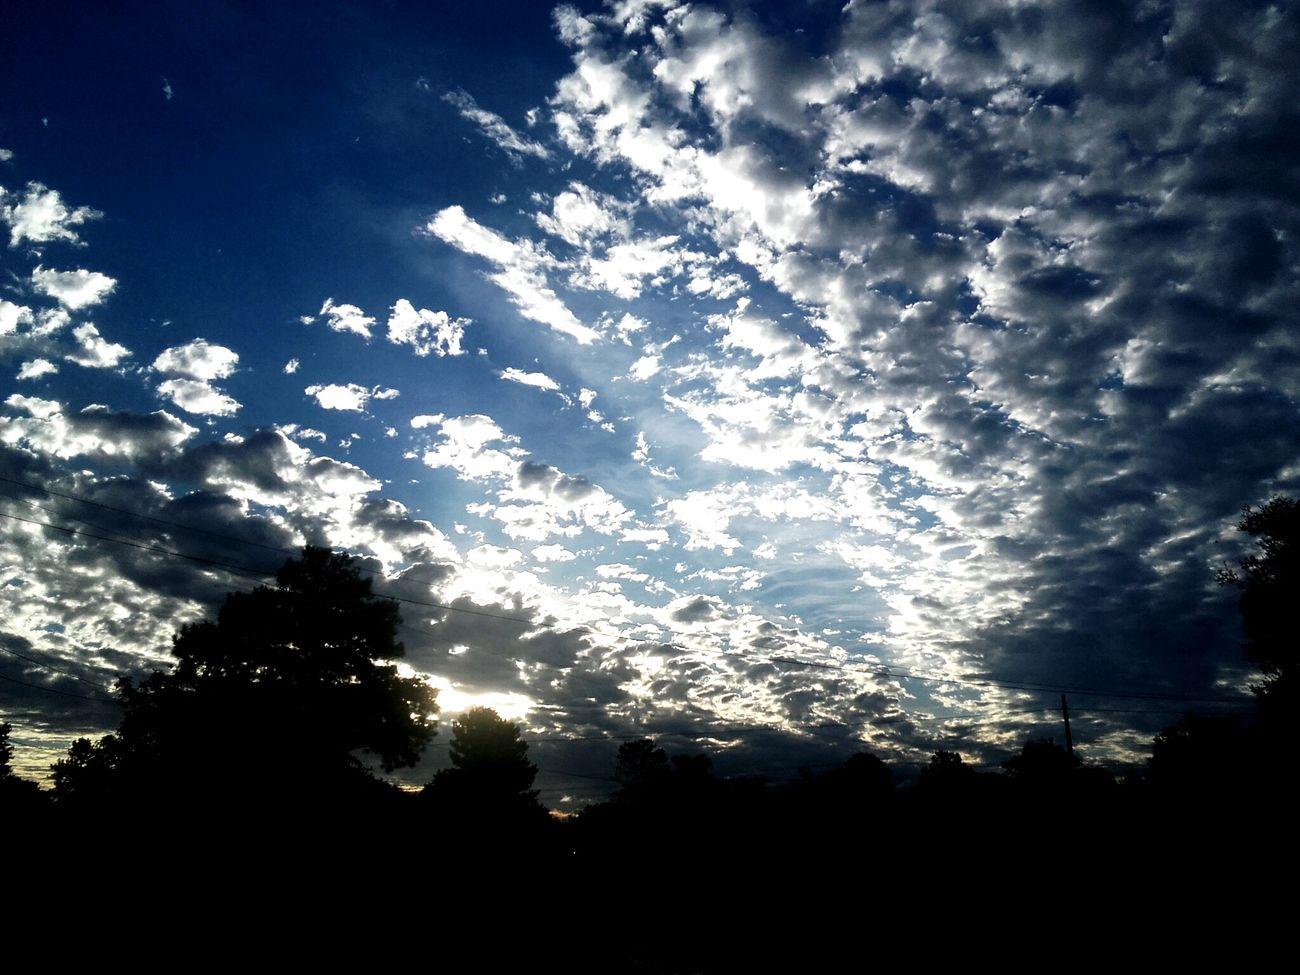 Nuves☁ Good Morning Good Day Dramatic Sky Naturaleza Maravillosa Nature Sky Paisajes Argentinos Nubesdealgodon Misiones Argentina . Paisaje Natural Arboles , Naturaleza Misiones, Argentina Cloud - Sky Daytime Photography EyeEm Nature Lover EyeEm